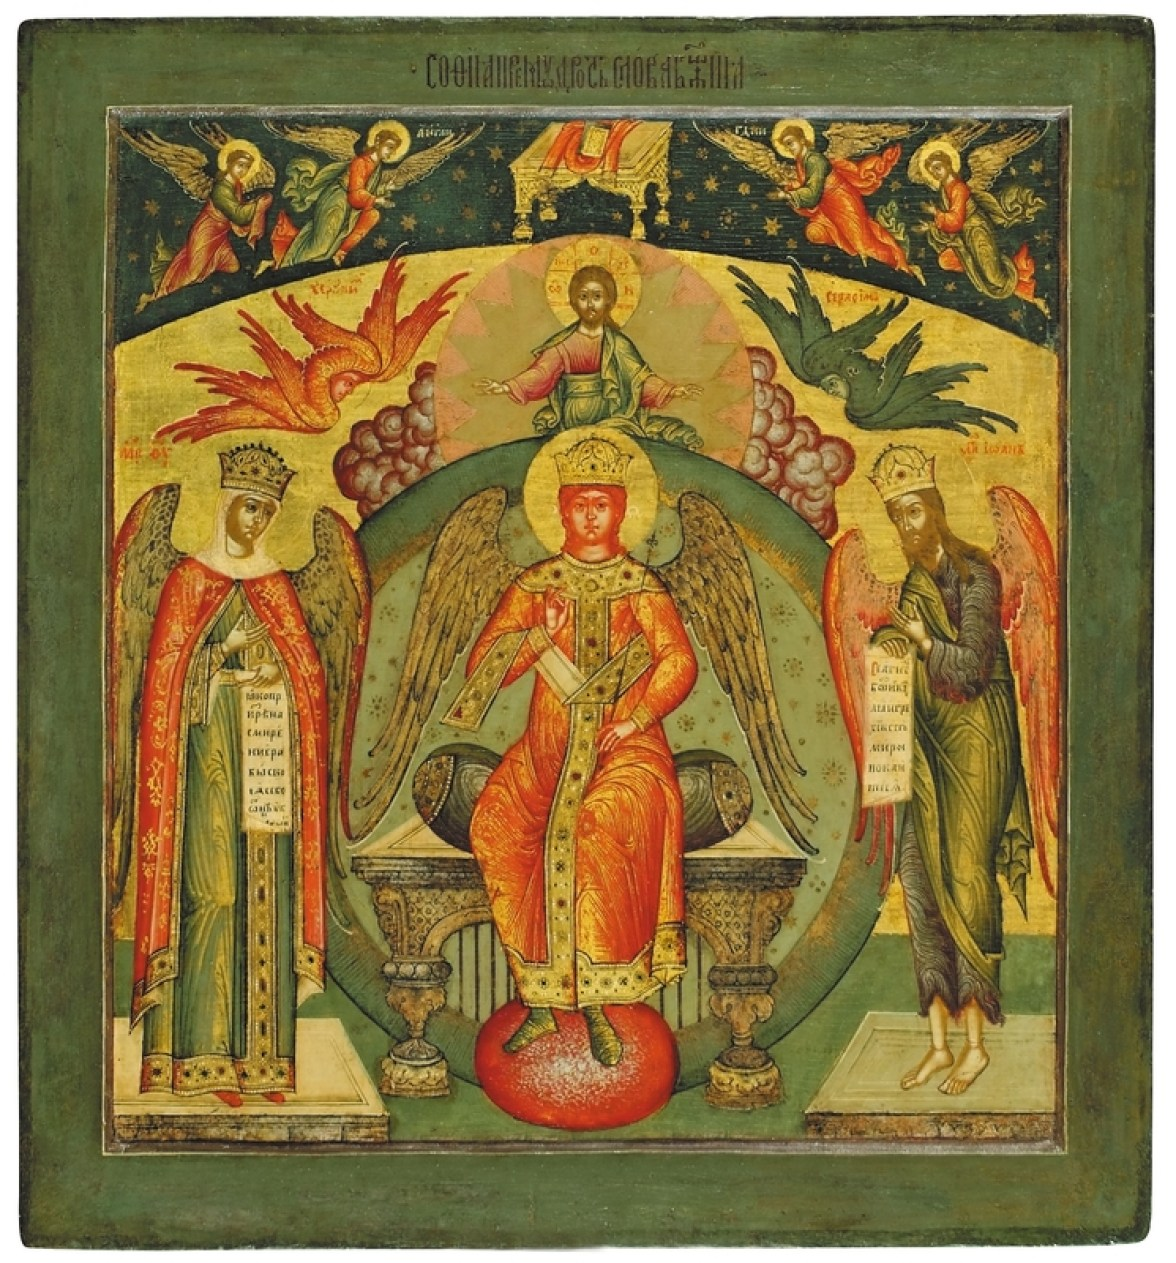 Sophia, the Divine Wisdom, third quarter of the 17th century. Tempera on wooden panel. 58 x 55 cm. Yaroslavl Art Museum, Yaroslavl, Russia.